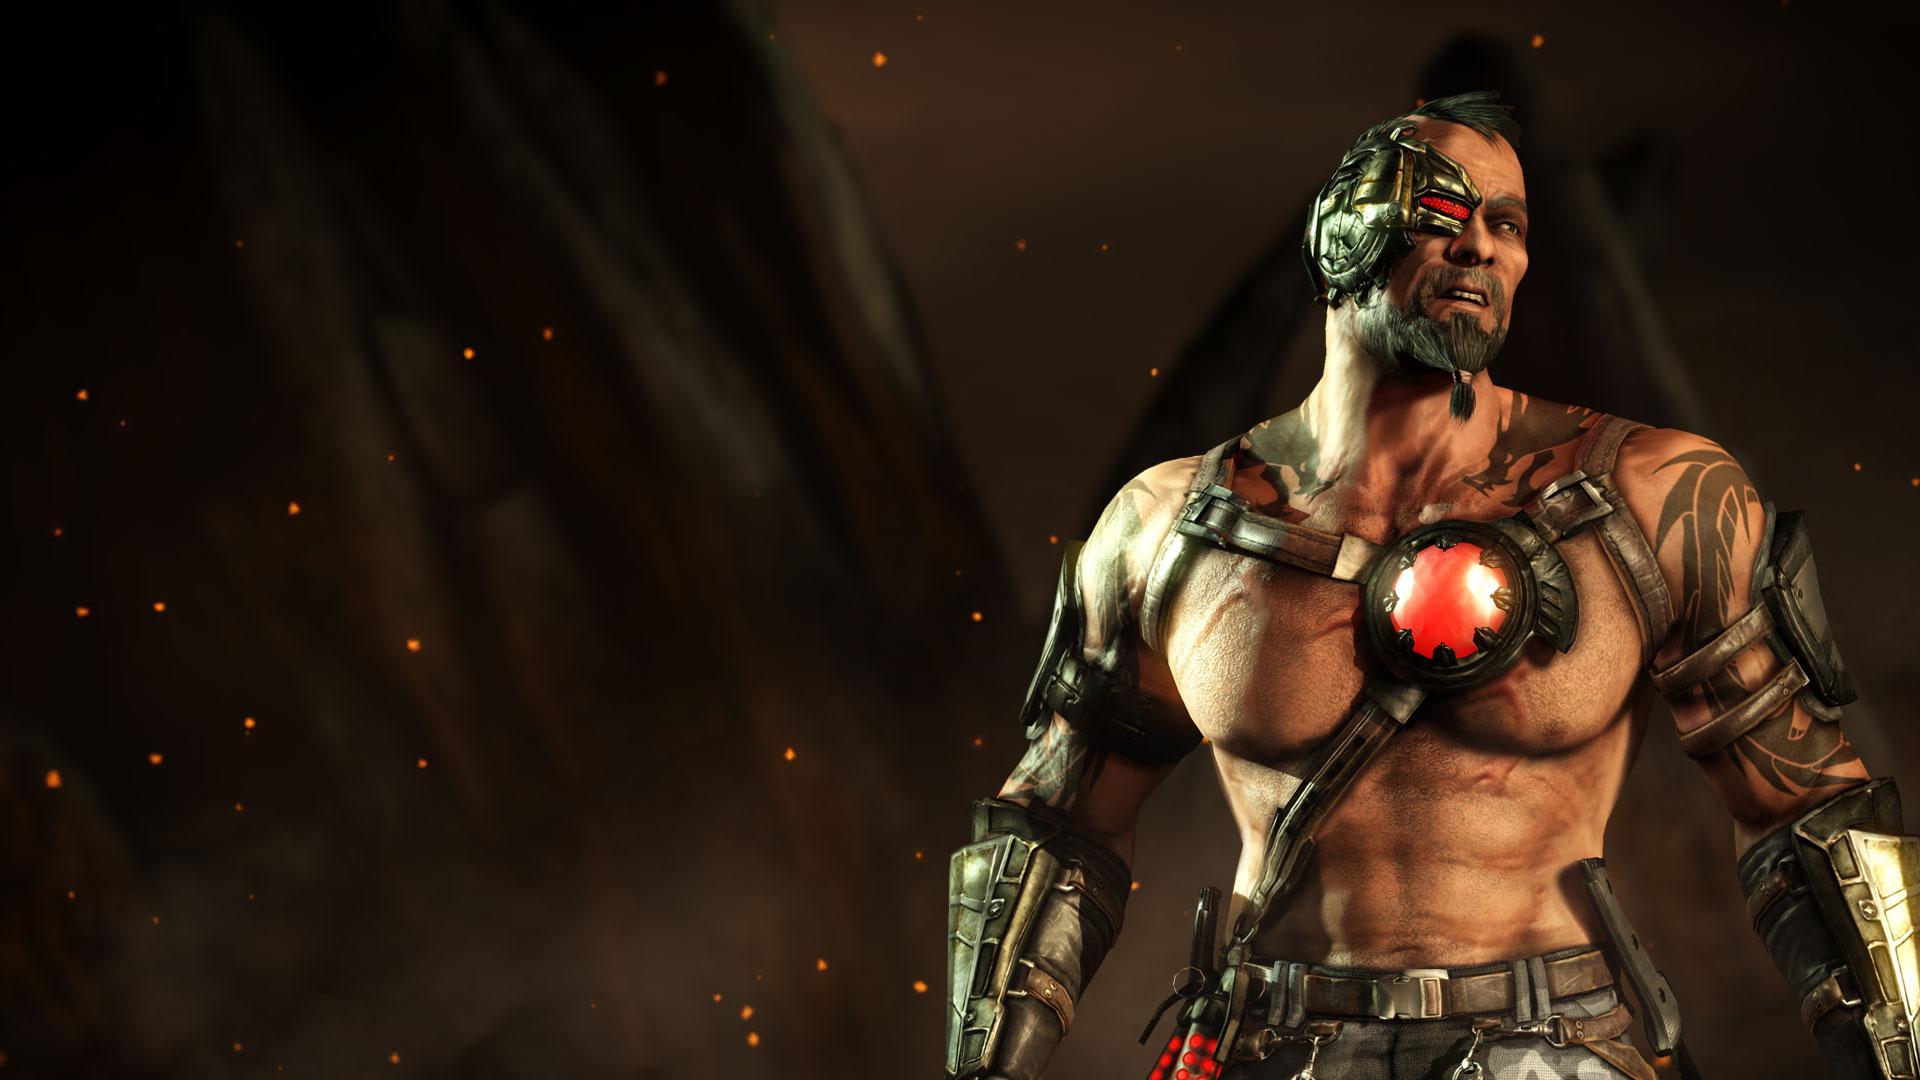 Amazon.com: Mortal Kombat X - Xbox One: Whv Games: Video Games